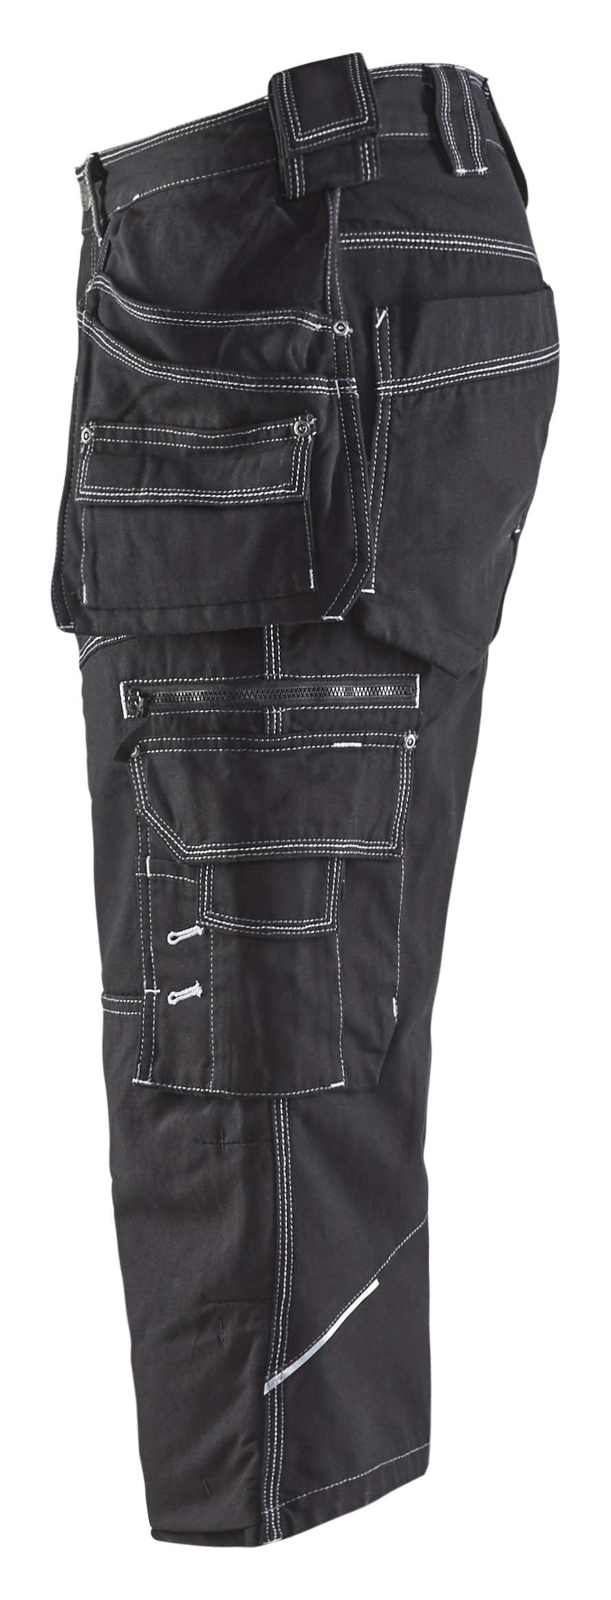 Blaklader Piraatbroeken 19621310 zwart(9900)